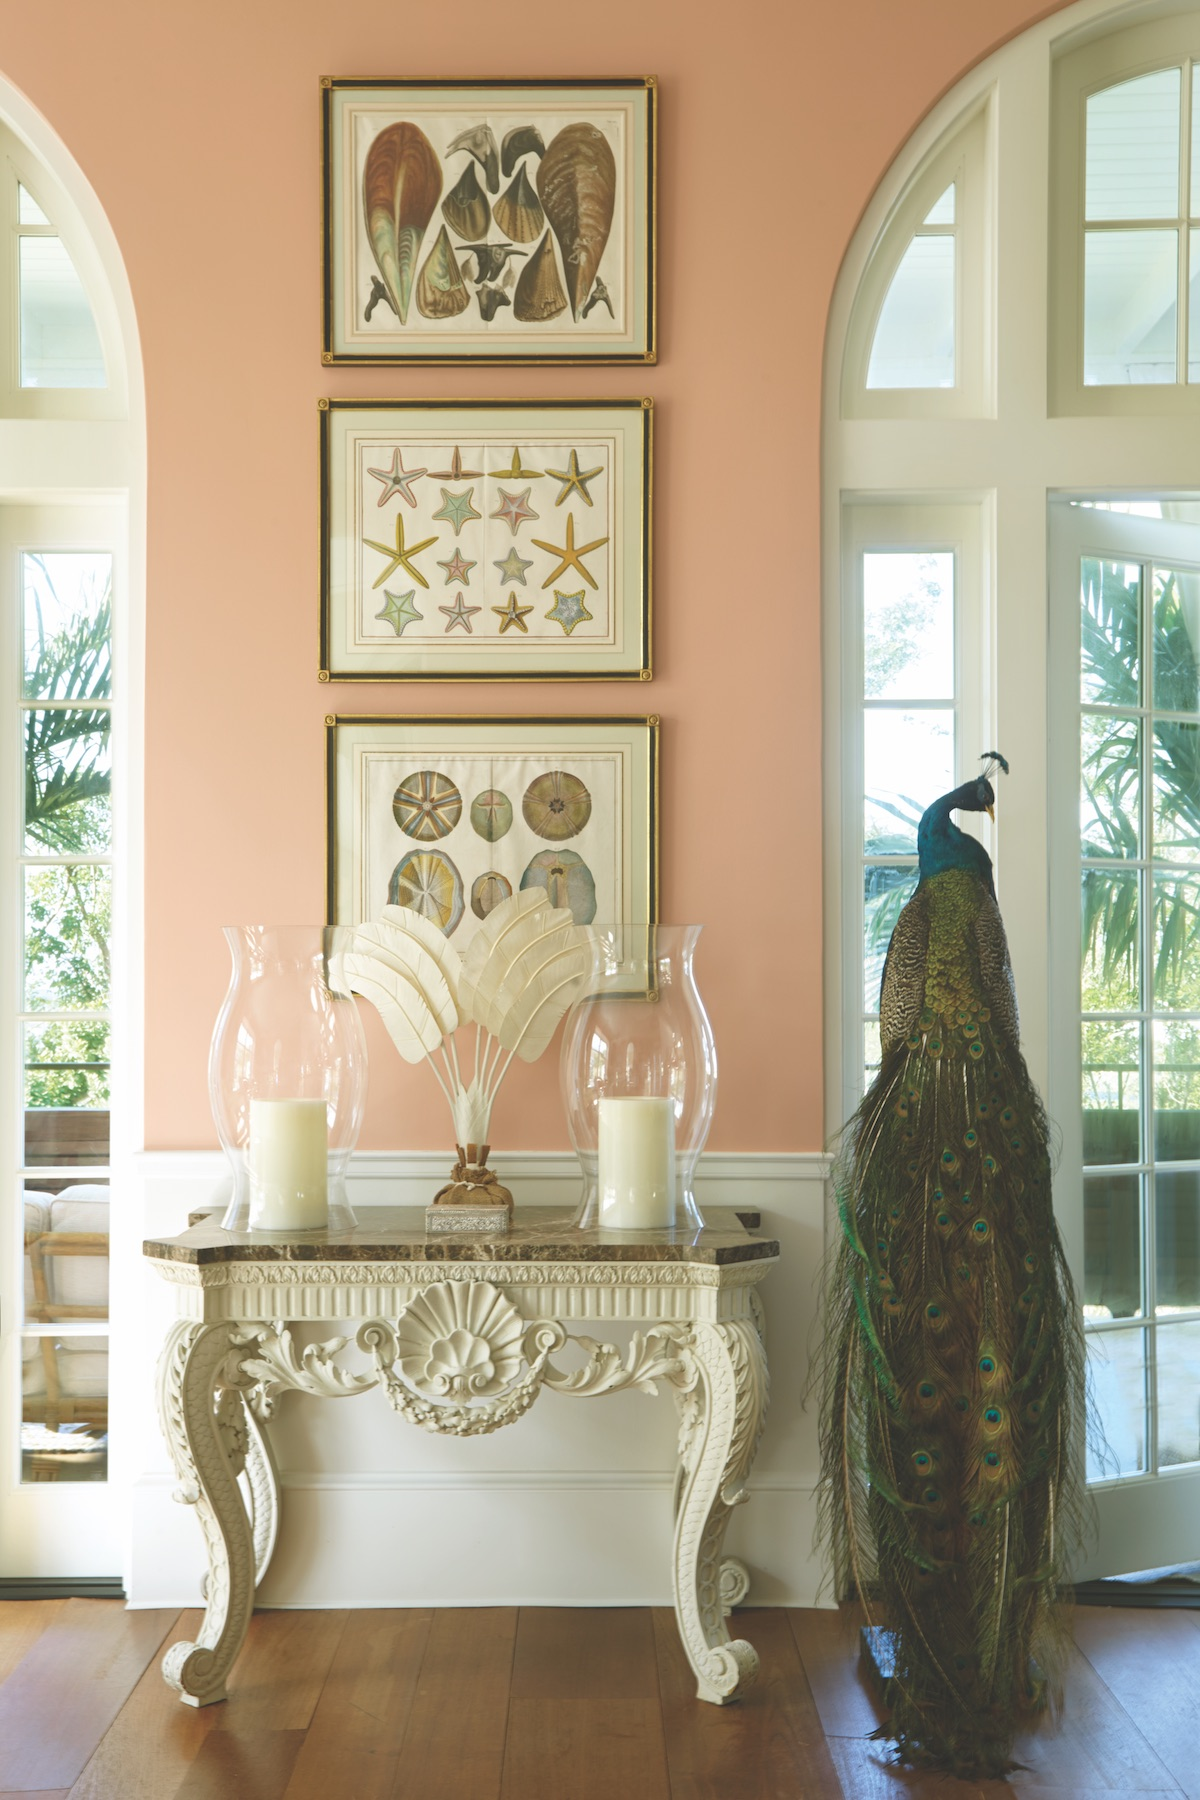 amanda lindroth designs on island time flower magazine